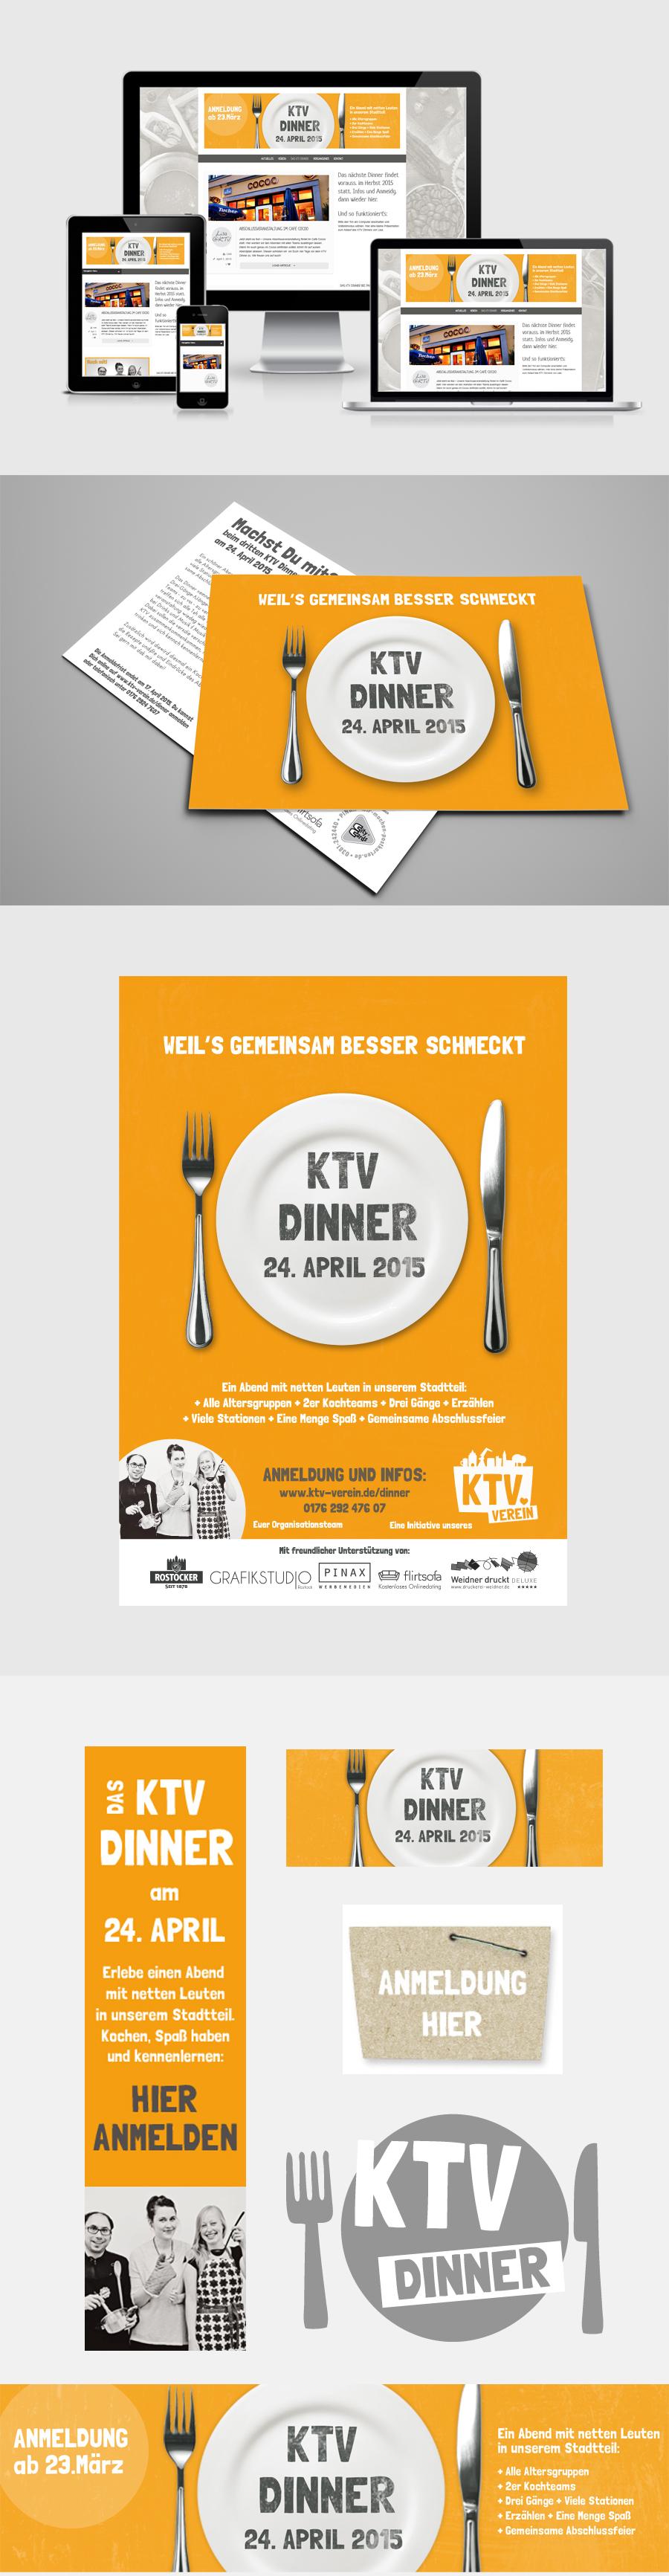 Event Branding Veranstaltung Design KTV Dinner Rostock Grafikdesign Grafikstudio Rostock